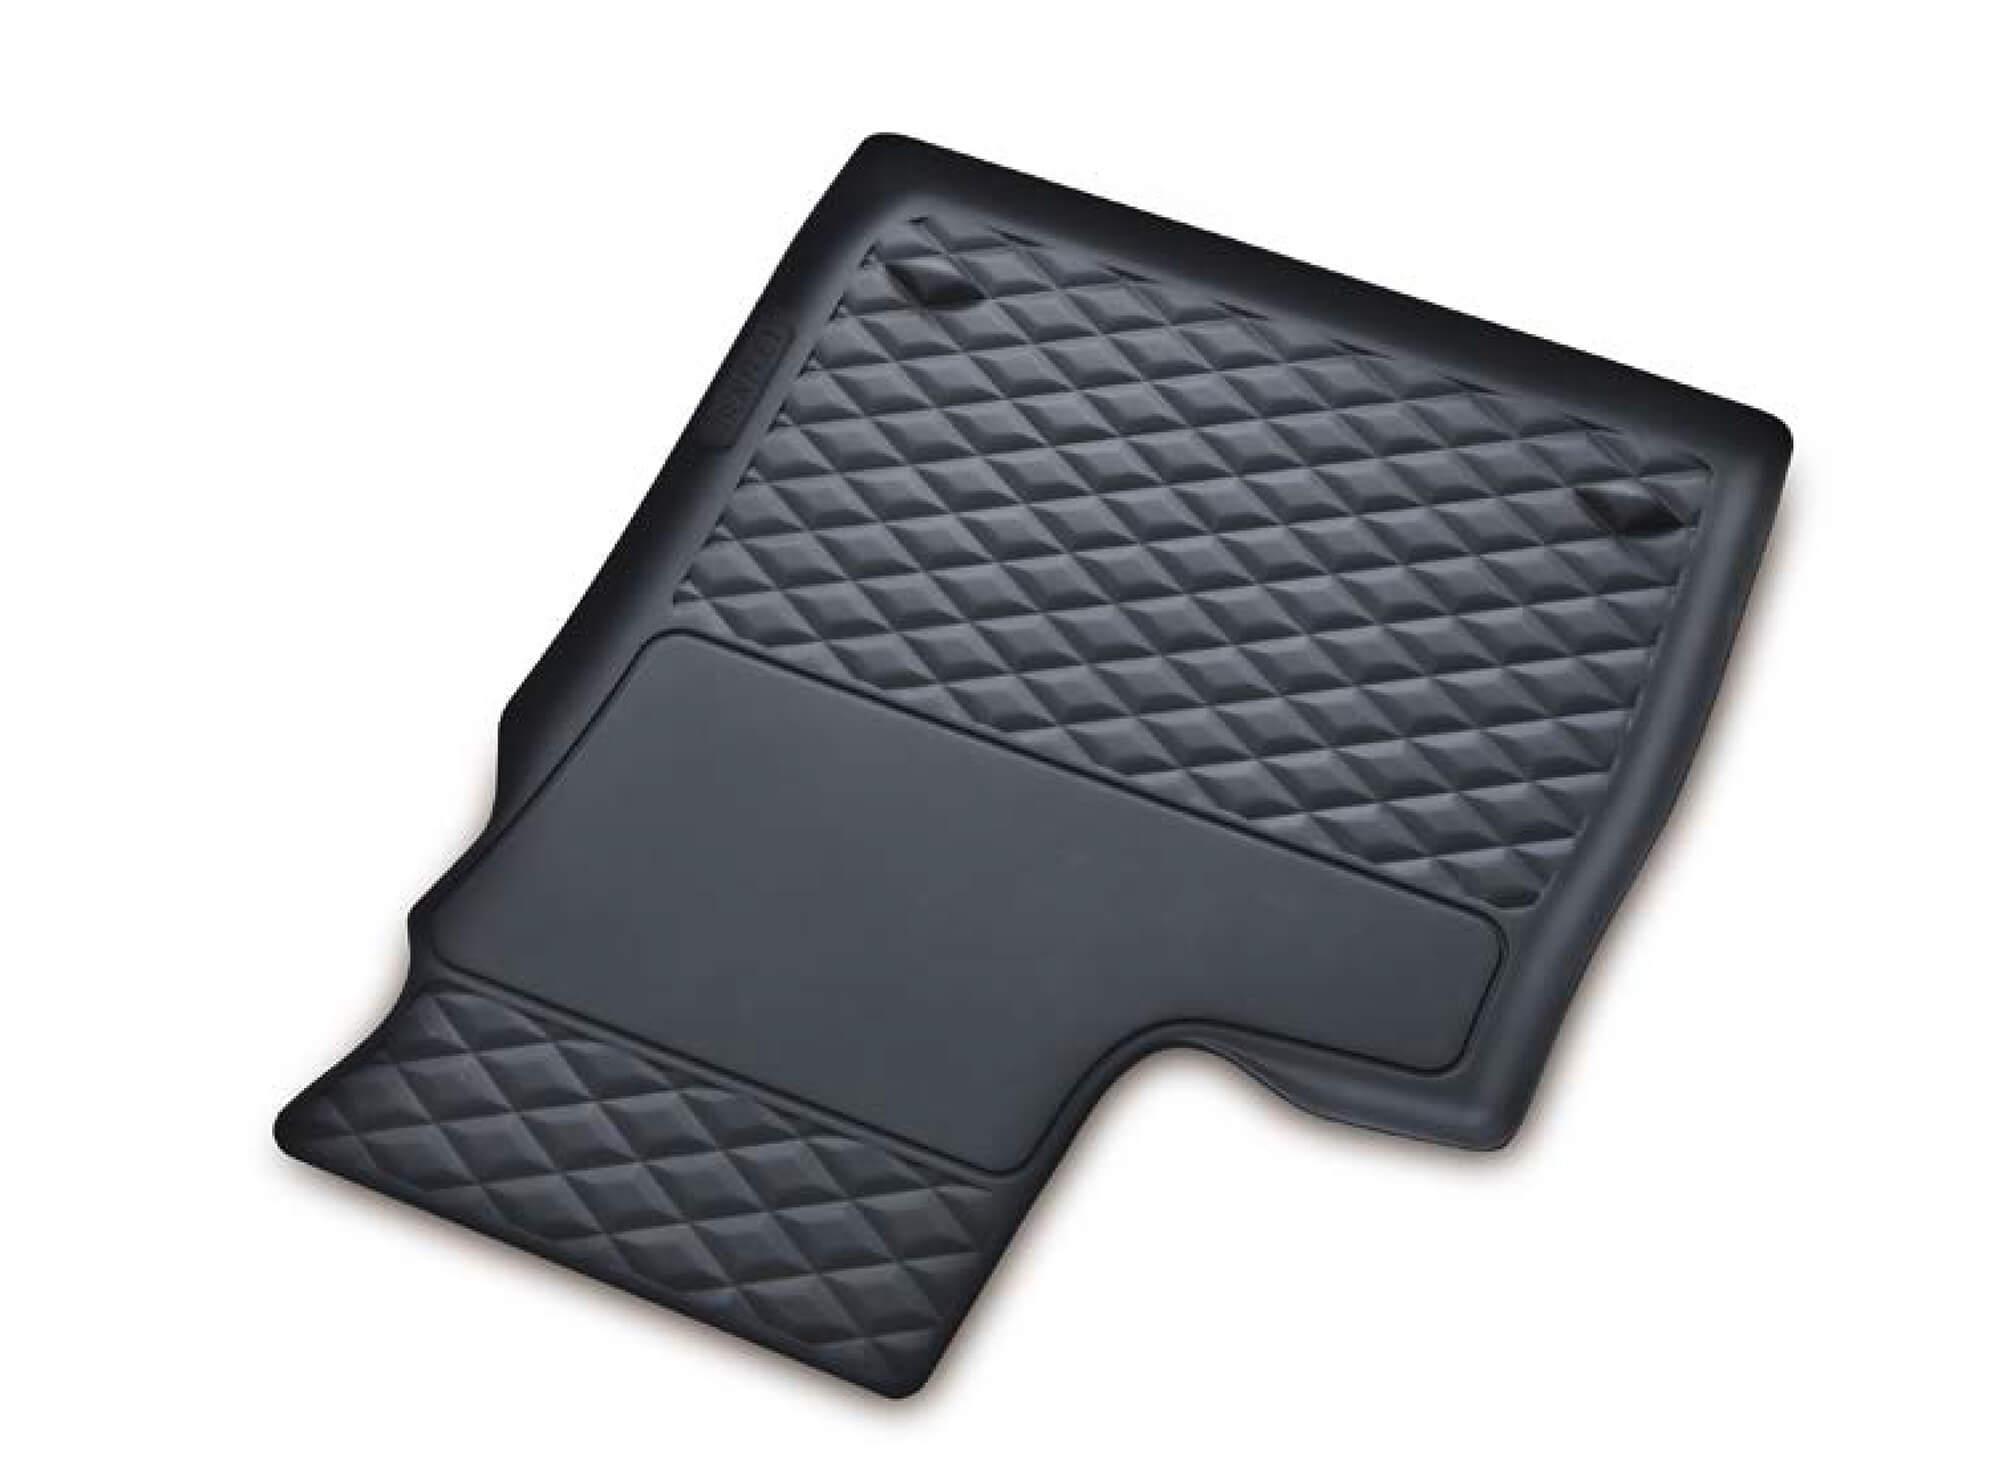 mats floors ridge duty jeep liner jeepmodreview floor com jku rugged replacements heavy